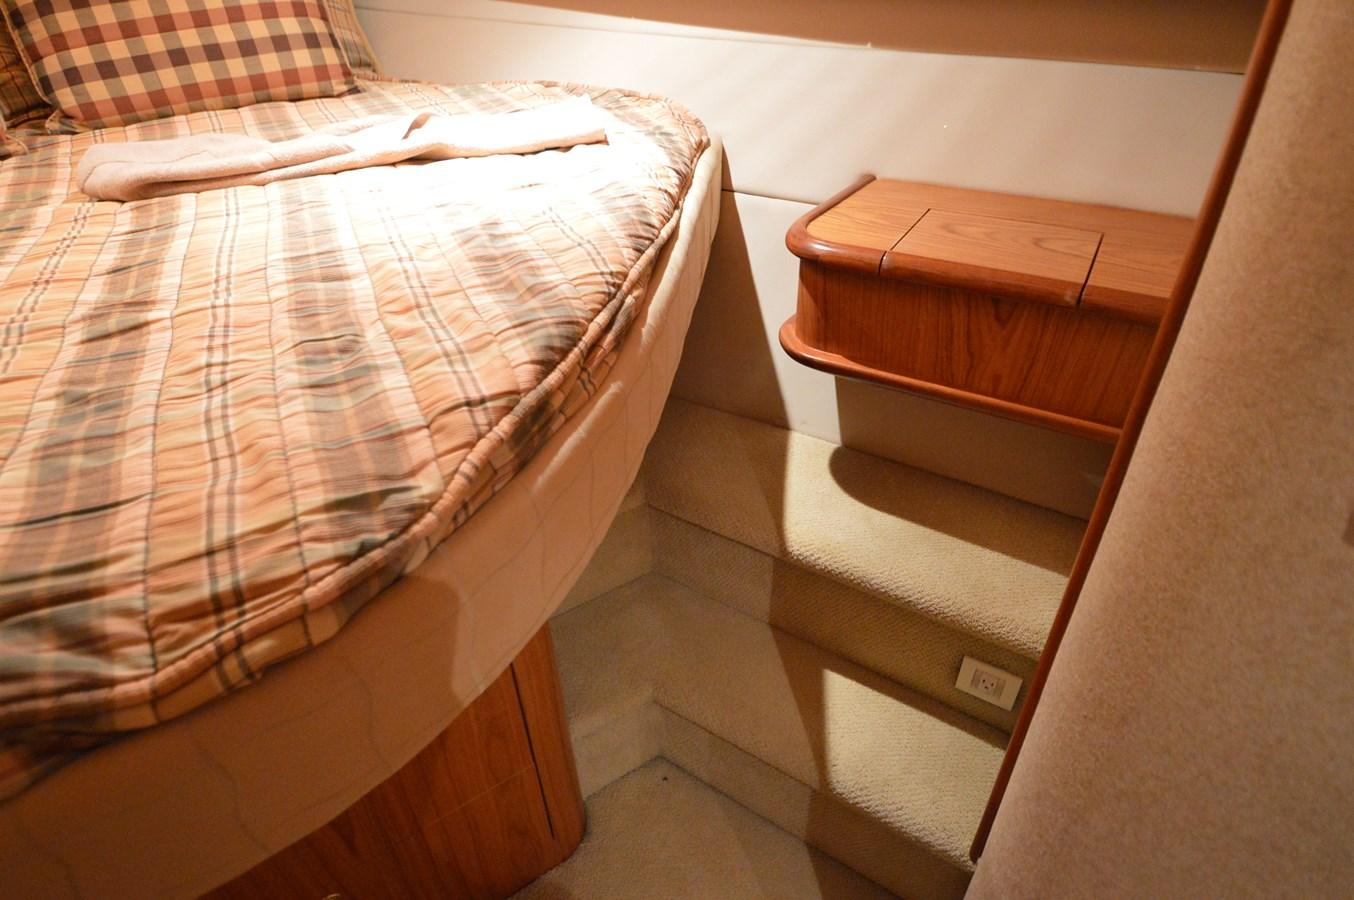 Fwd Stateroom Steps - 58 BUDDY DAVIS For Sale